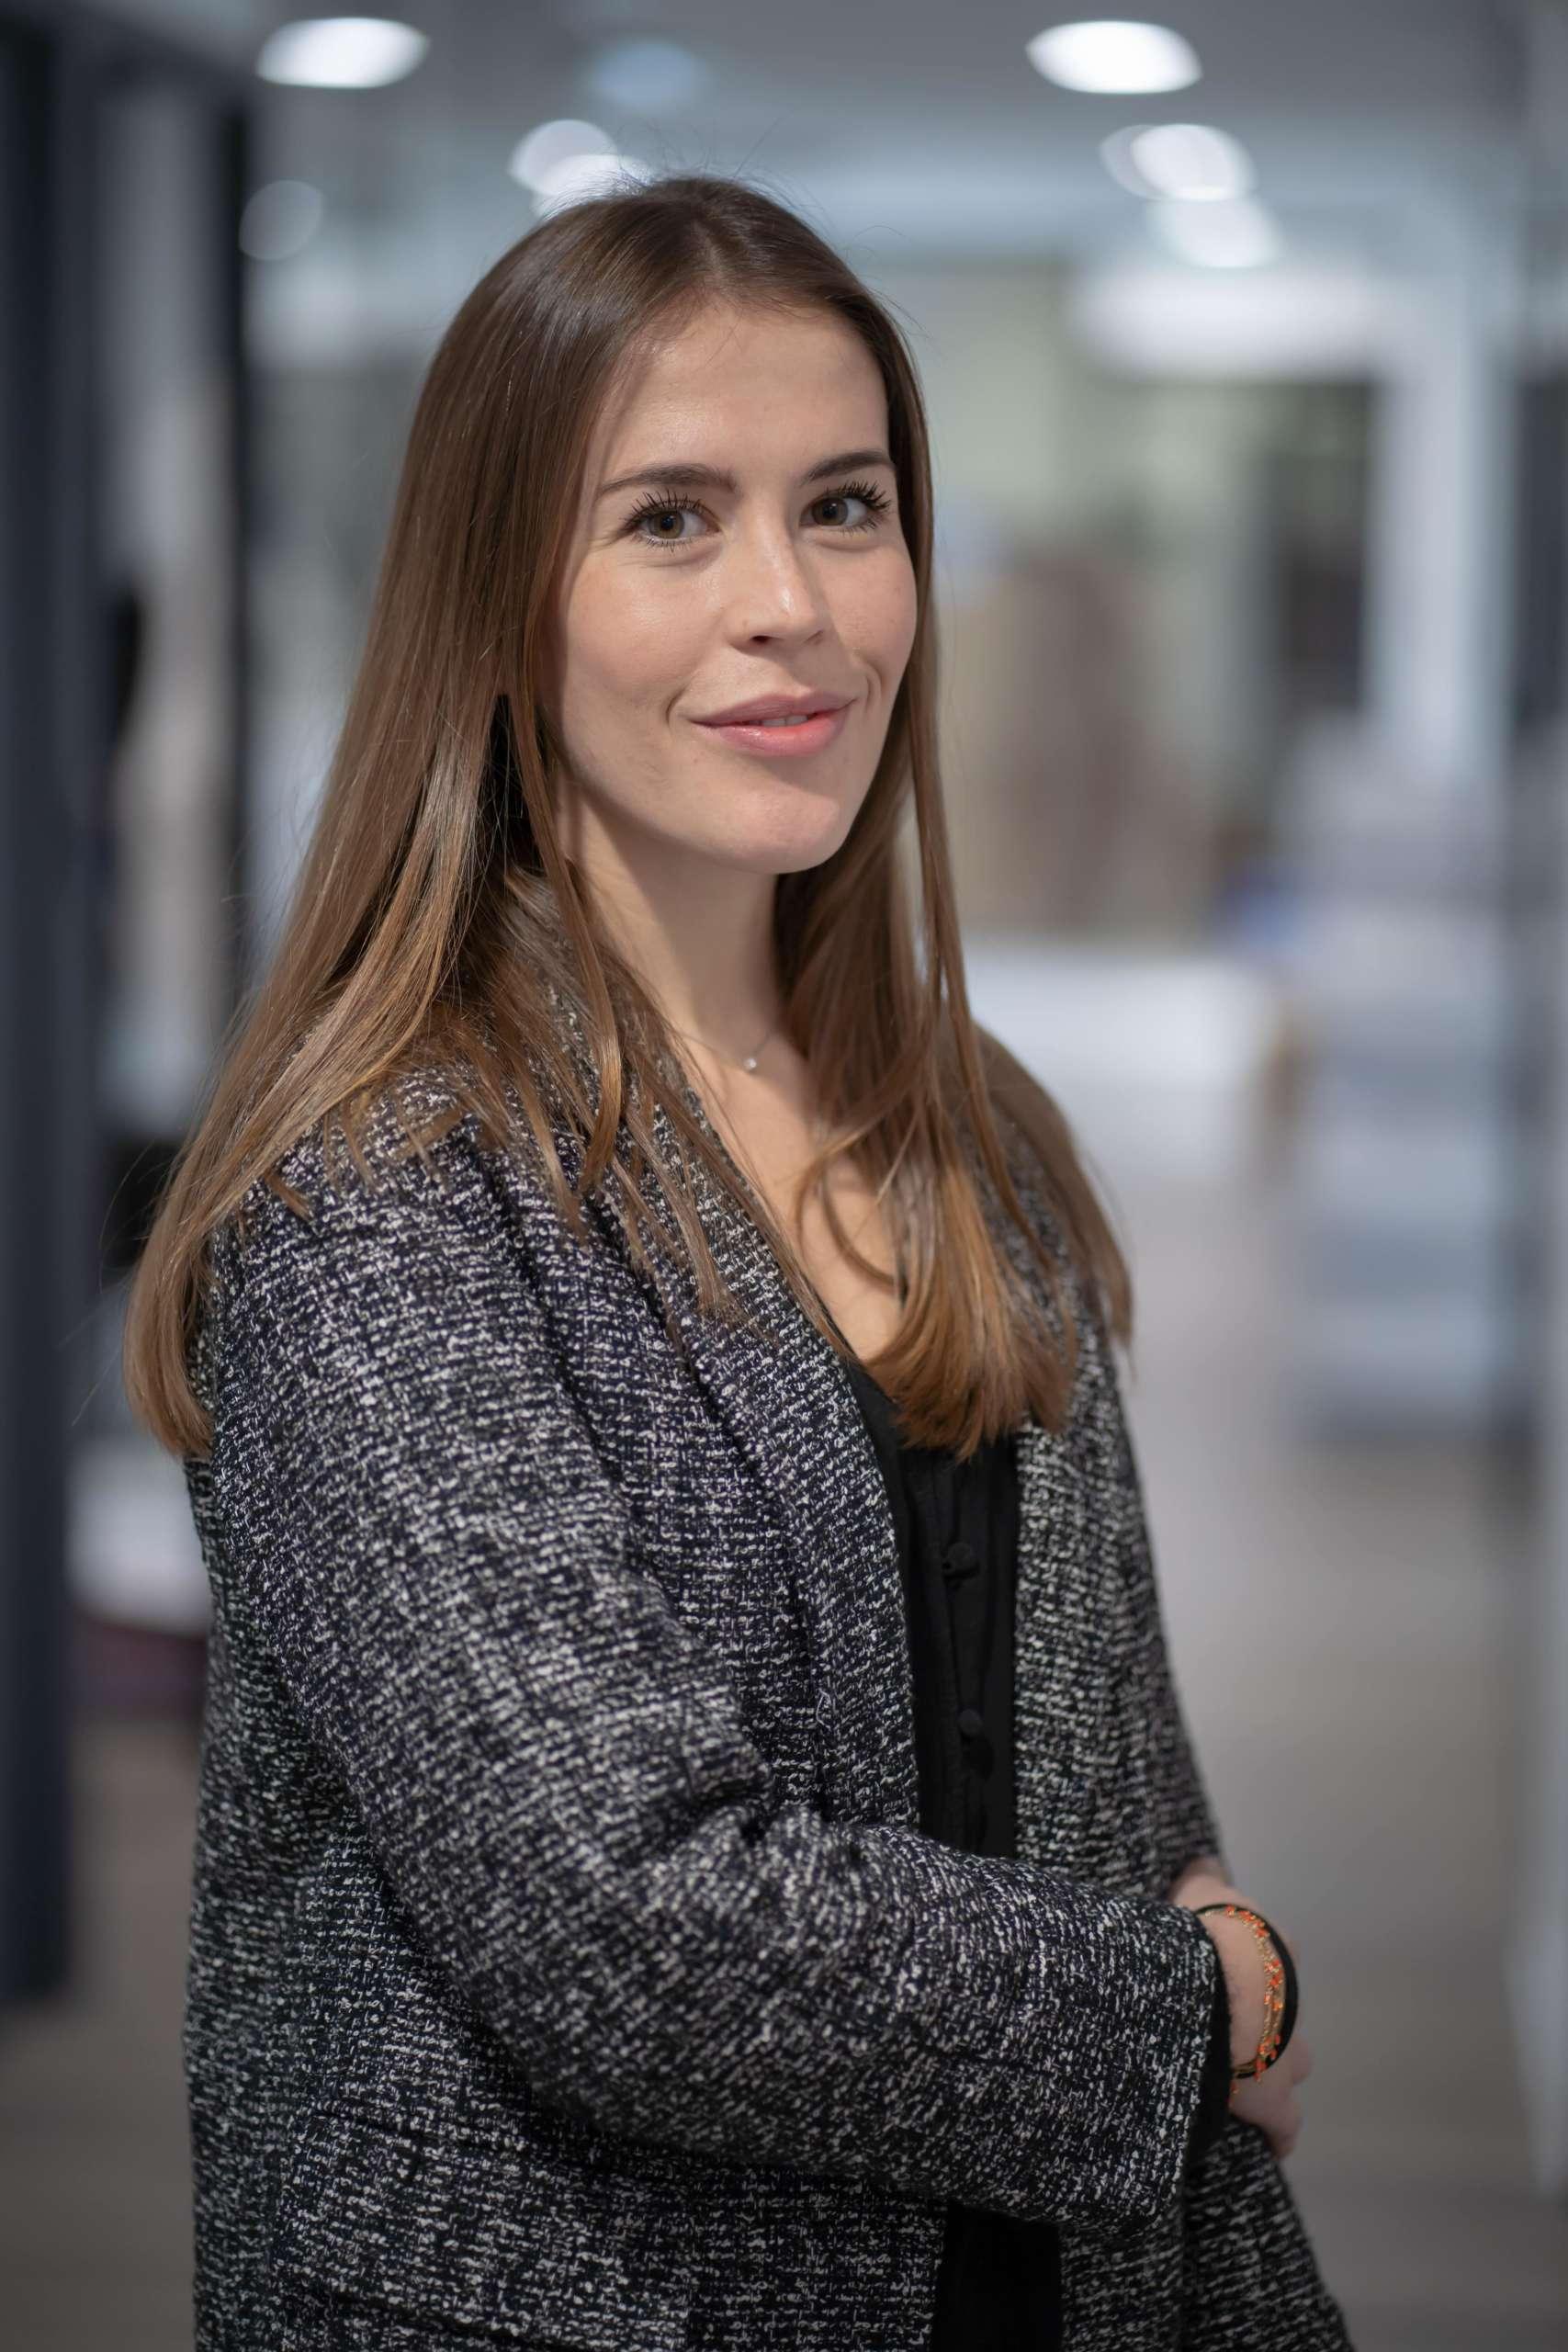 Julia de Keyser